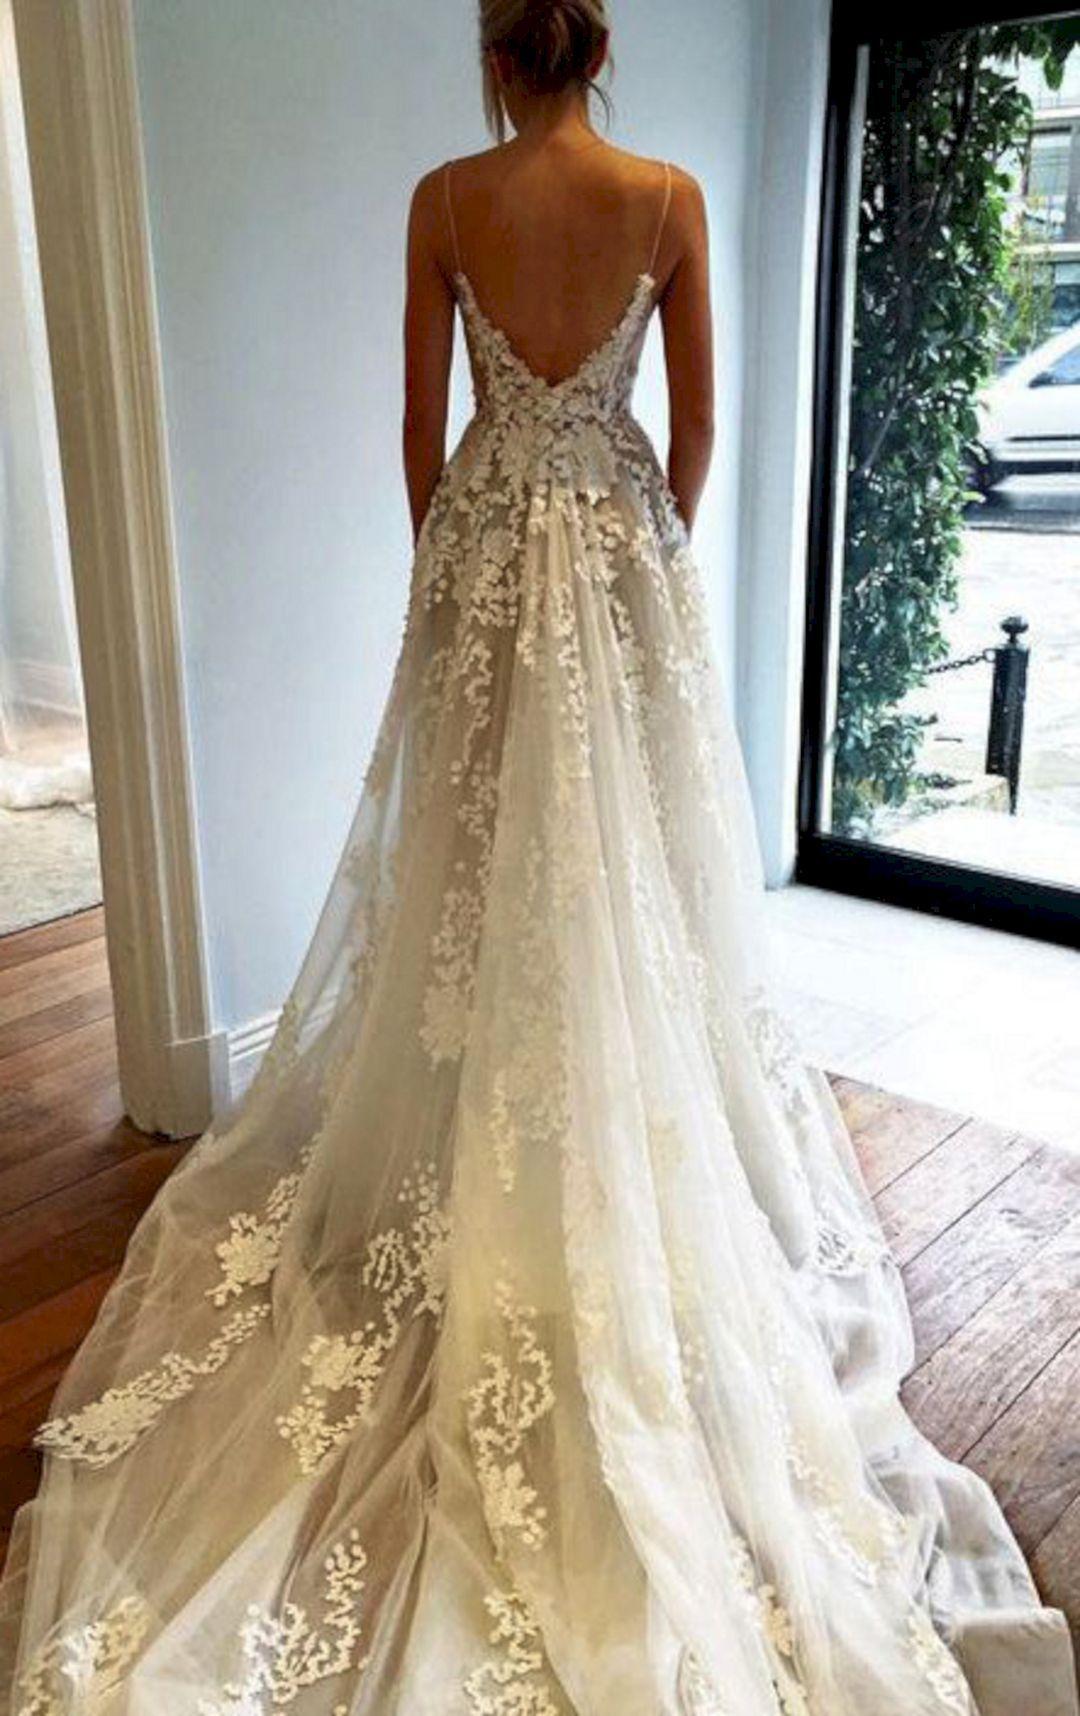 44+ Stunning Wedding Dresses & Gowns for Your Big Day | Brautkleider ...